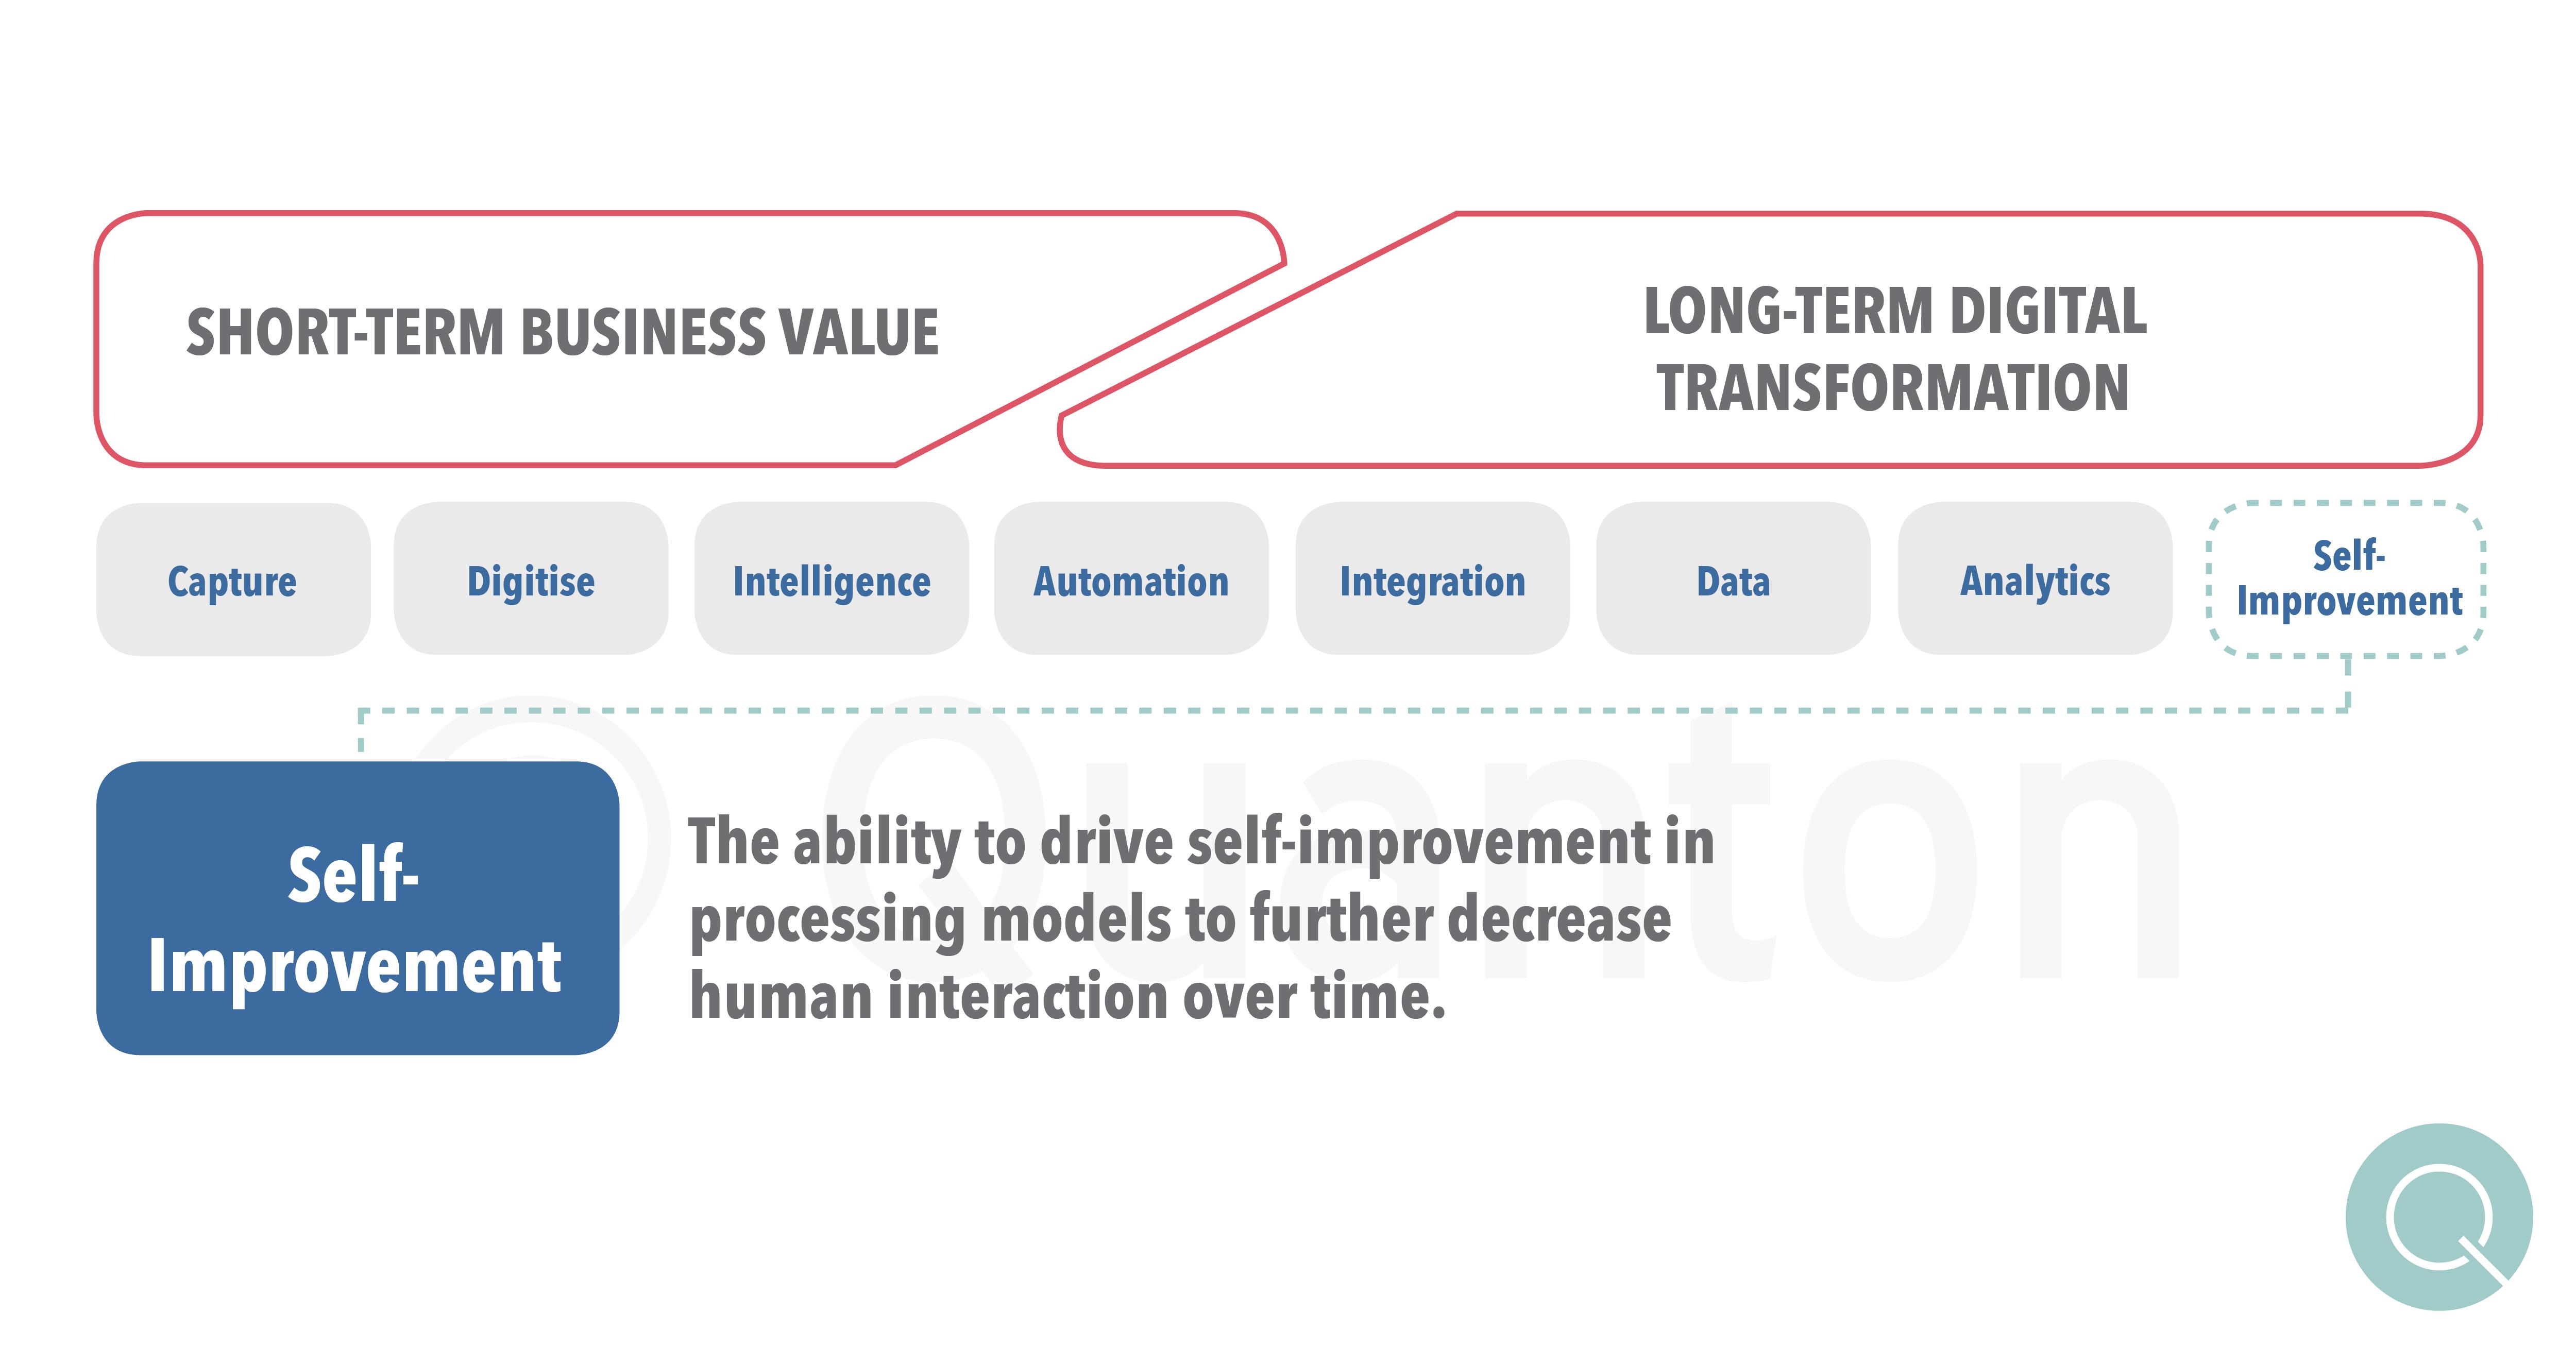 Quanton 8 Technology Enablers for Digital Transformation - Self-Improvement